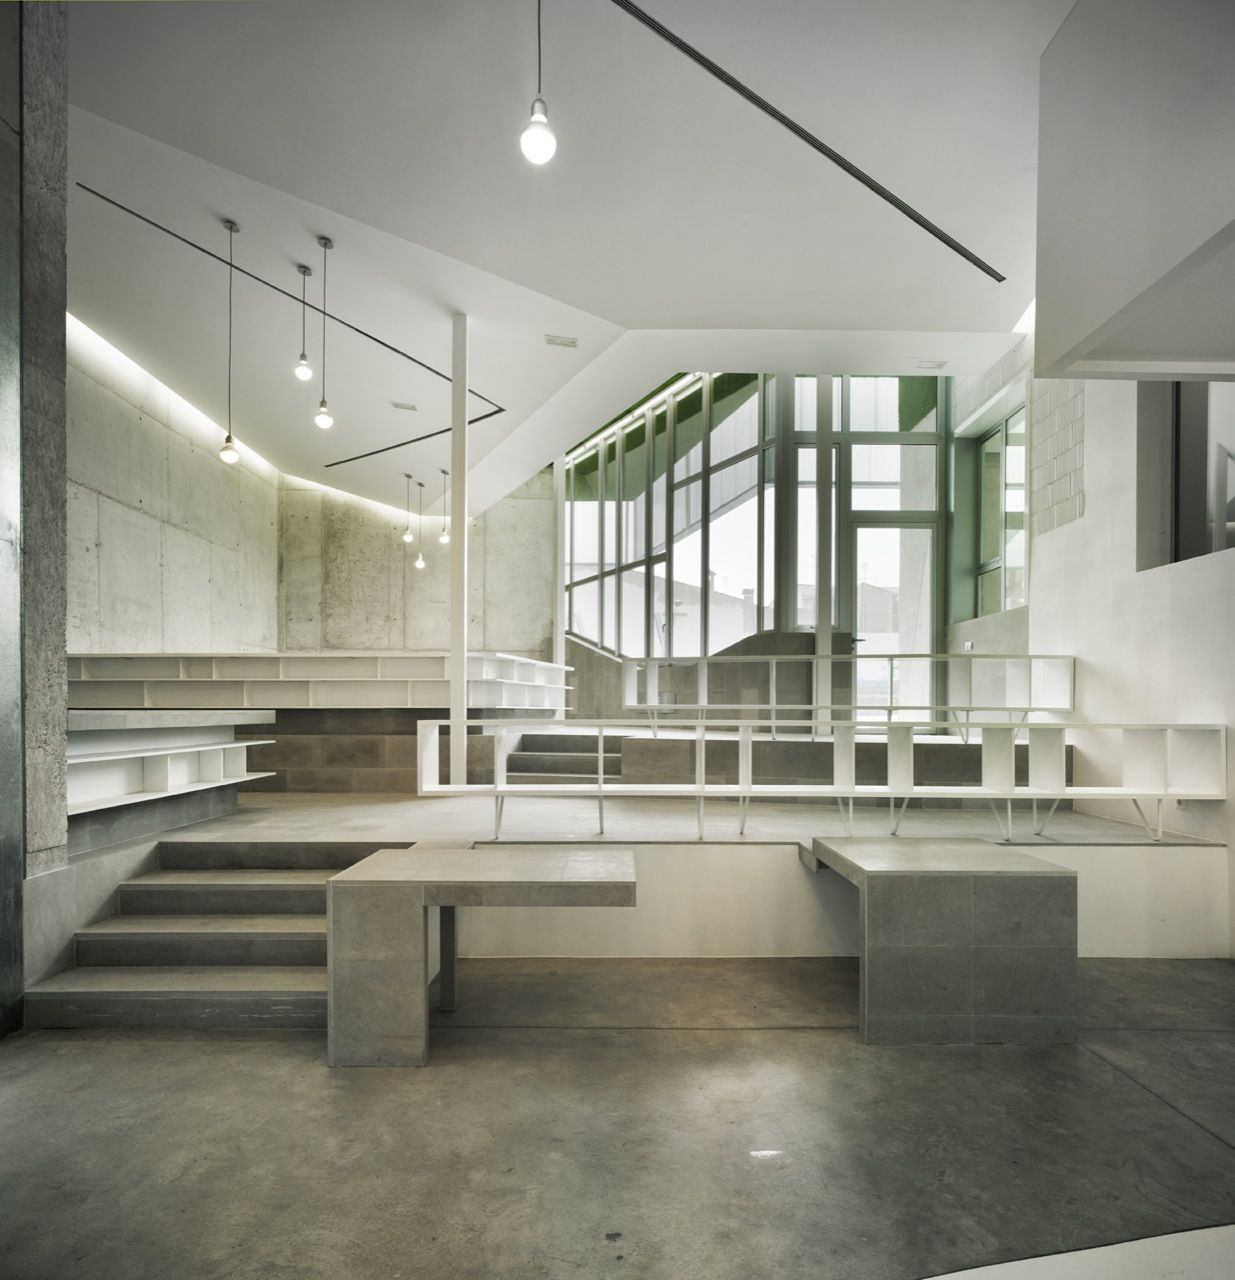 Novelda Public Space Spacious Interior Design Palads community